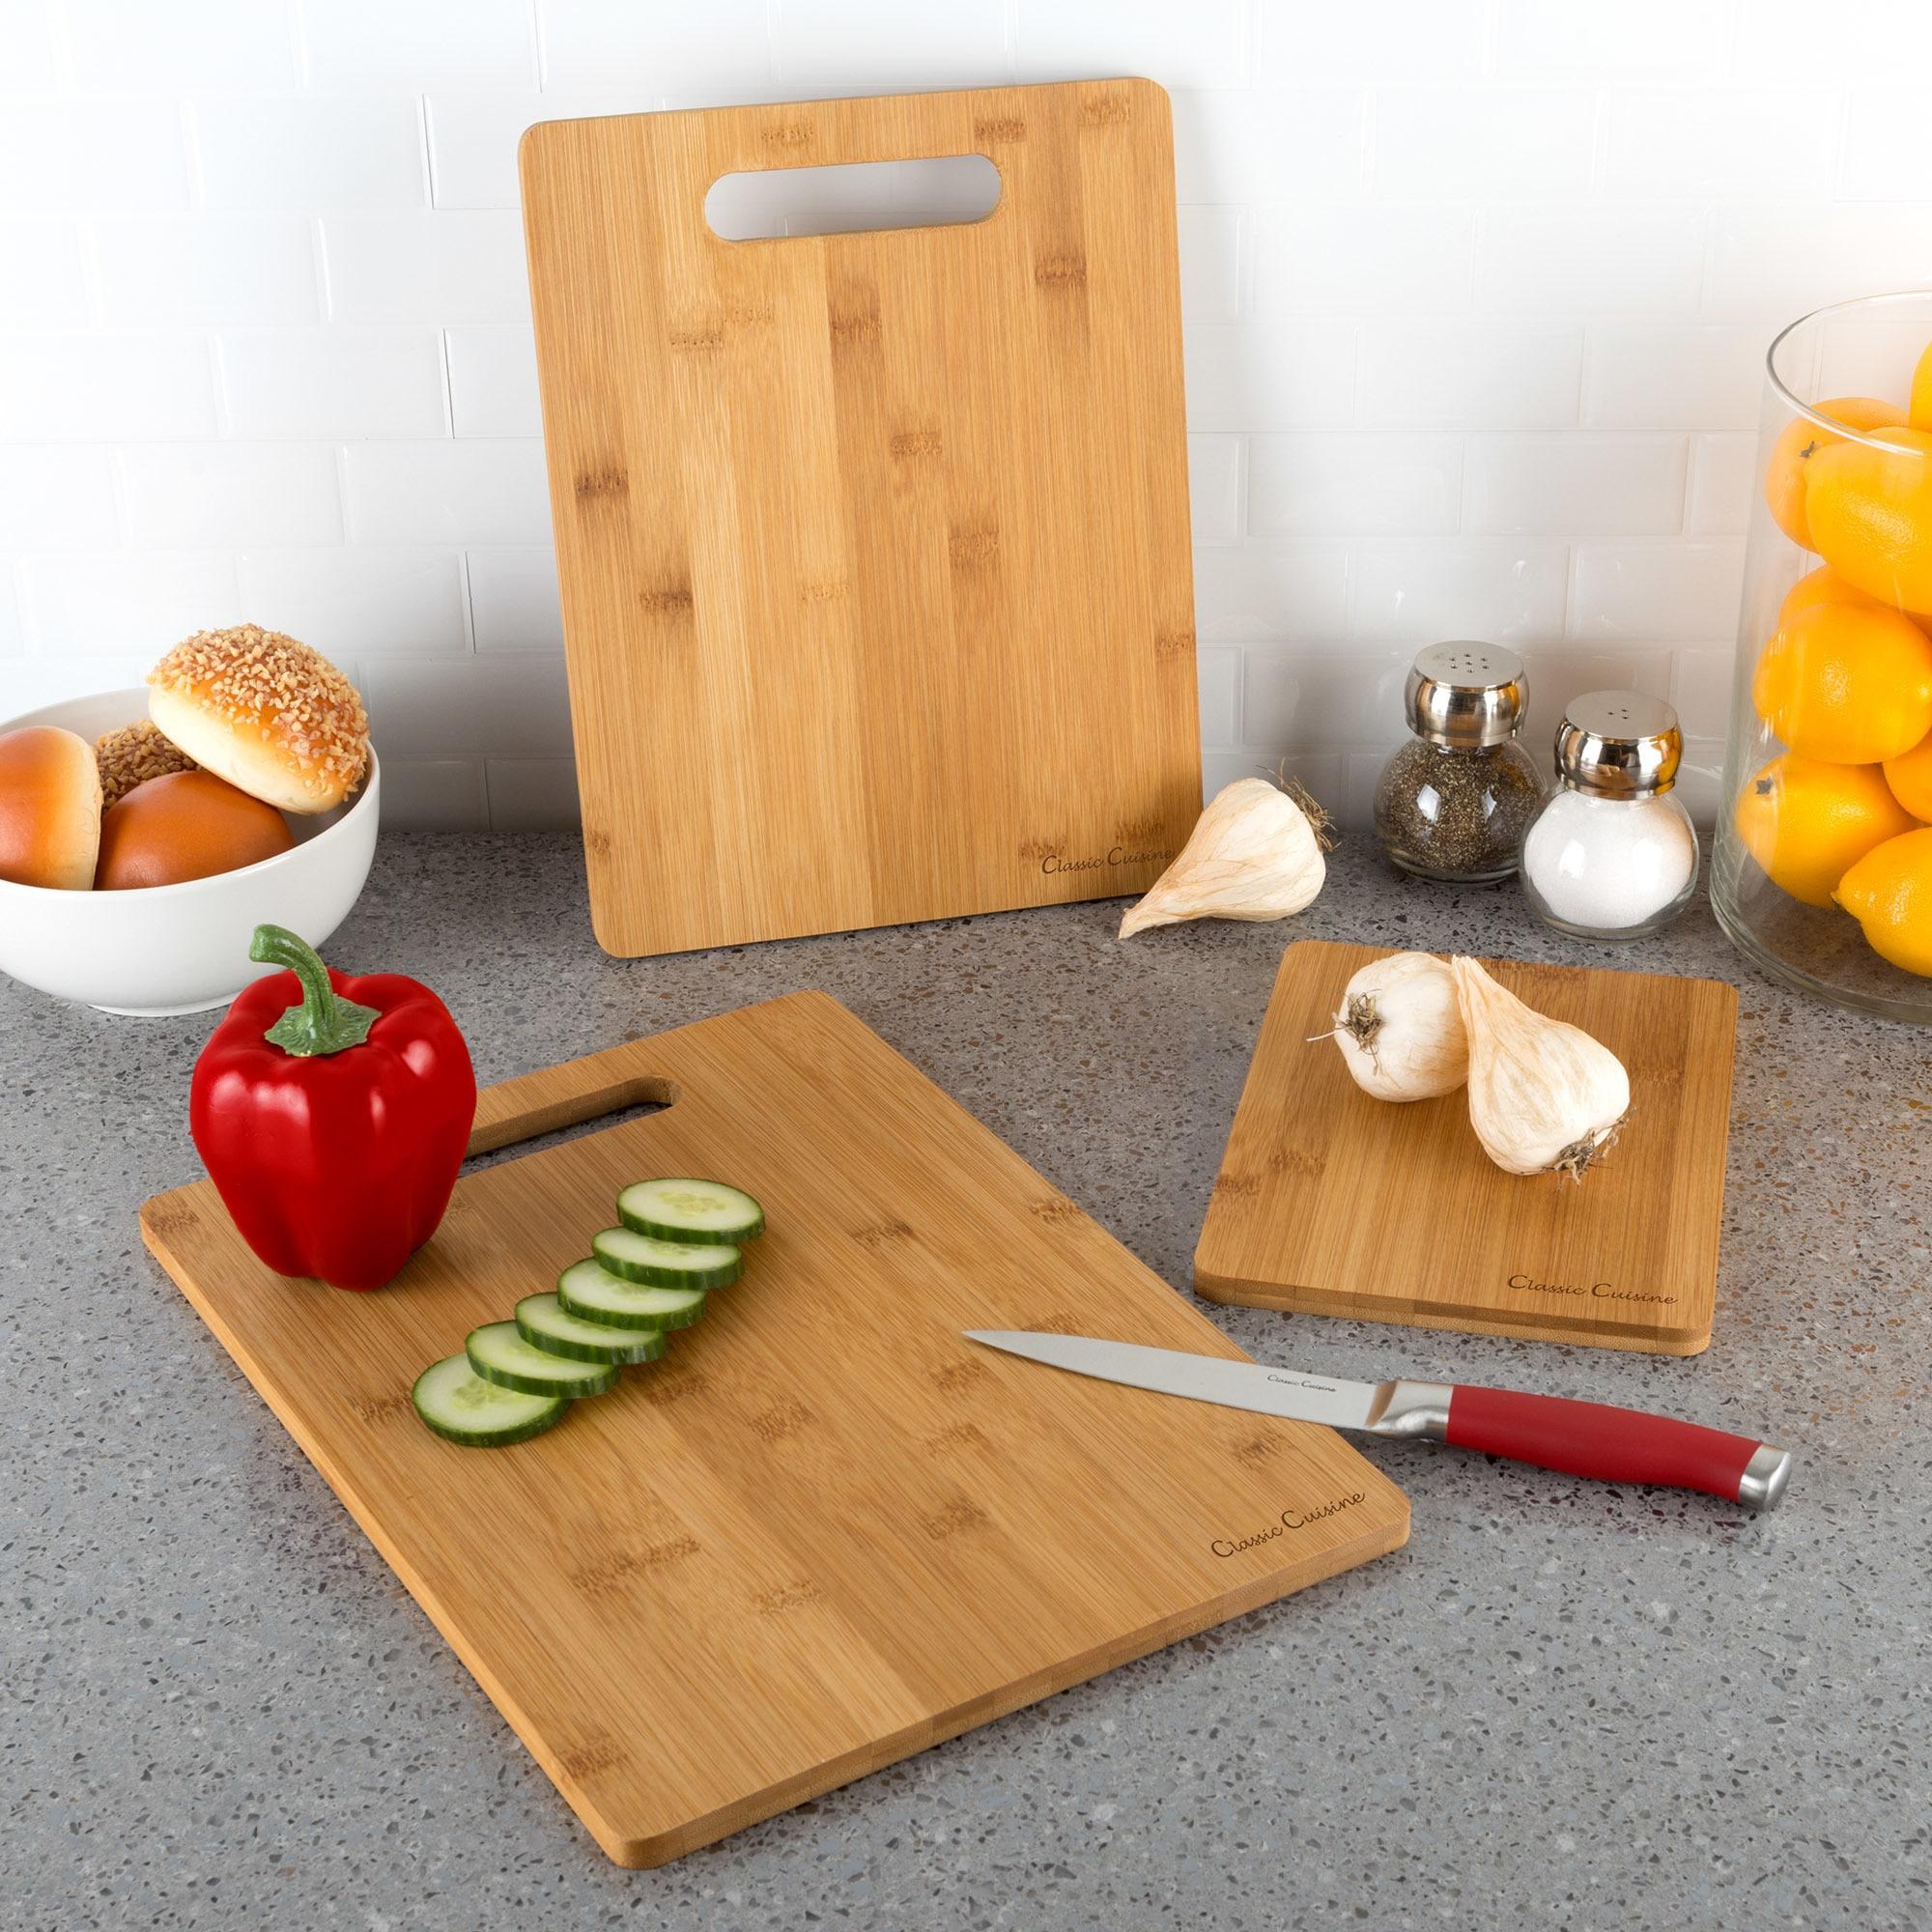 Shop Classic Cuisine 3 Piece Bamboo Cutting Board Set Free